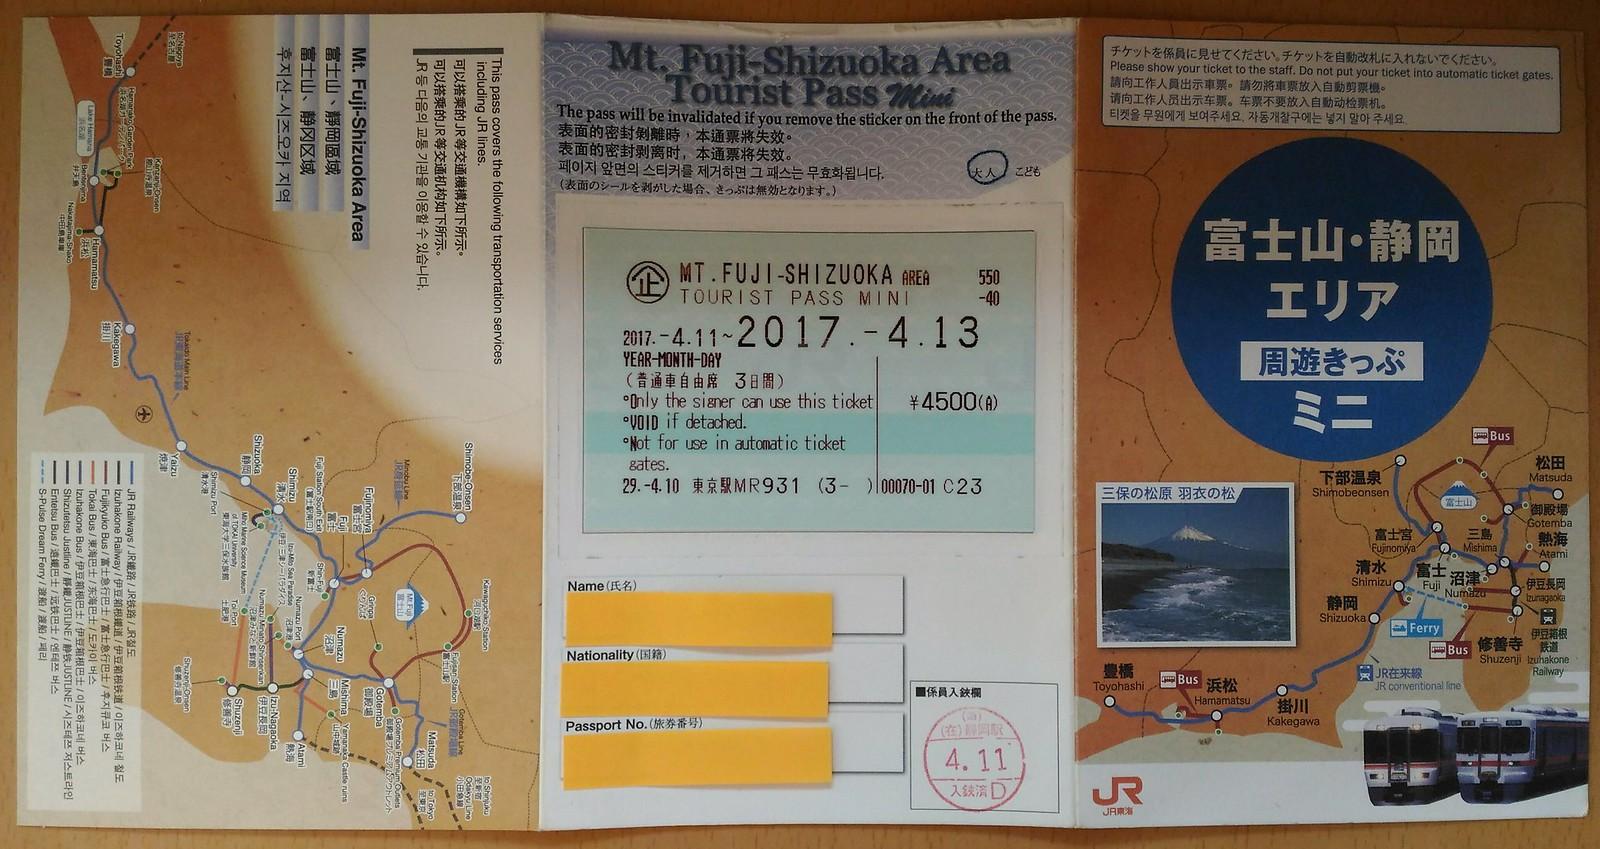 Jr Passmini Maptabi Mount Fuji Shizuoka Tourist Pass Mini 3 Days 2017 06 04 03 18 37